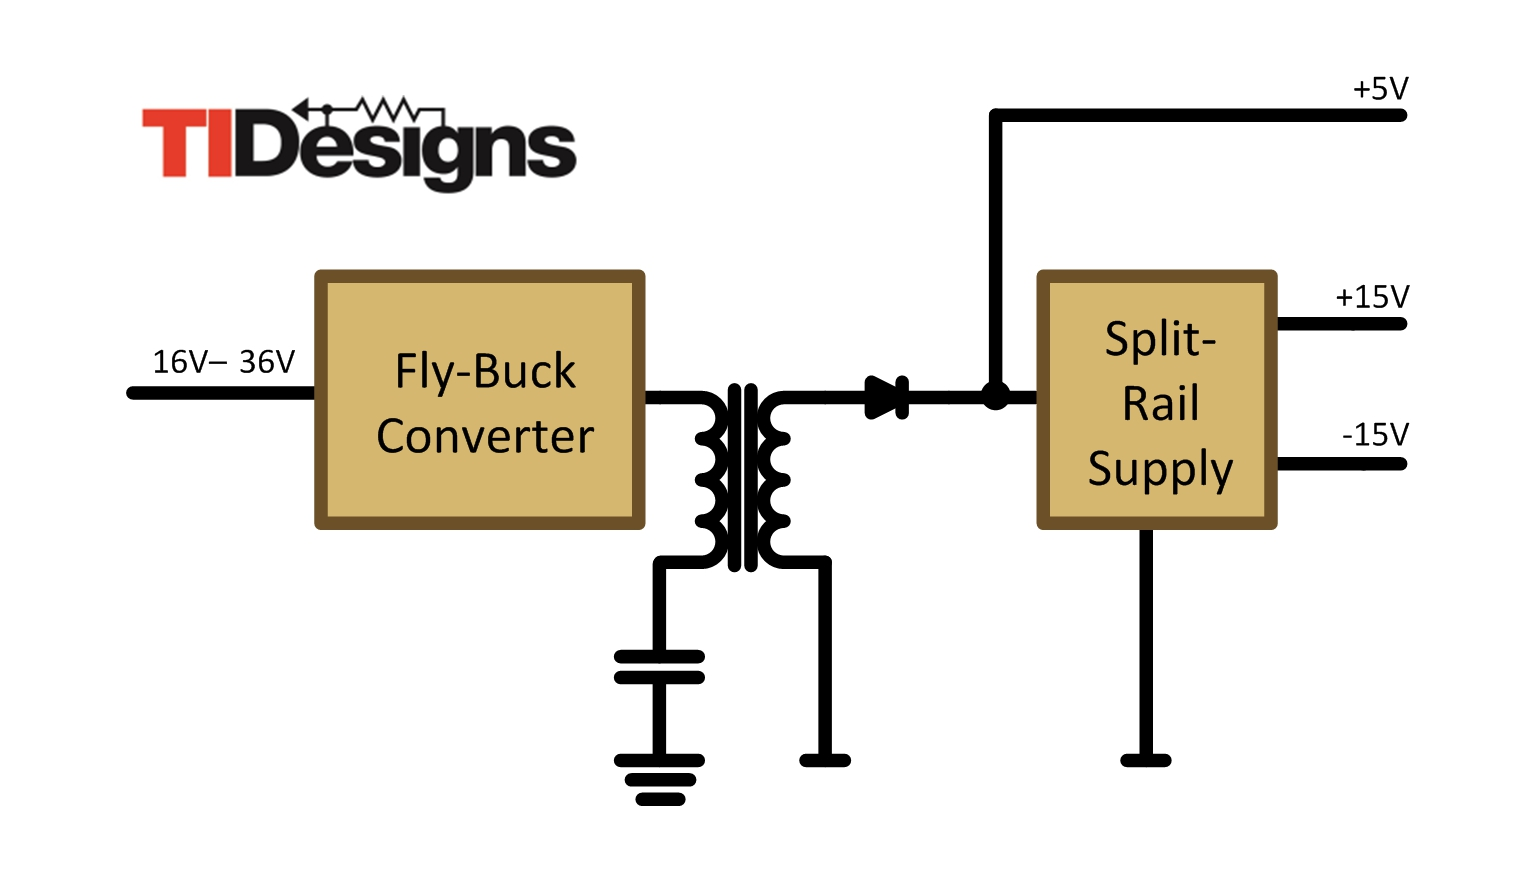 Where Shrinking Makes Sense Improving Isolated Split Rail Power 12to 16vdc Regulated Supply Circuit Diagram New Implementation